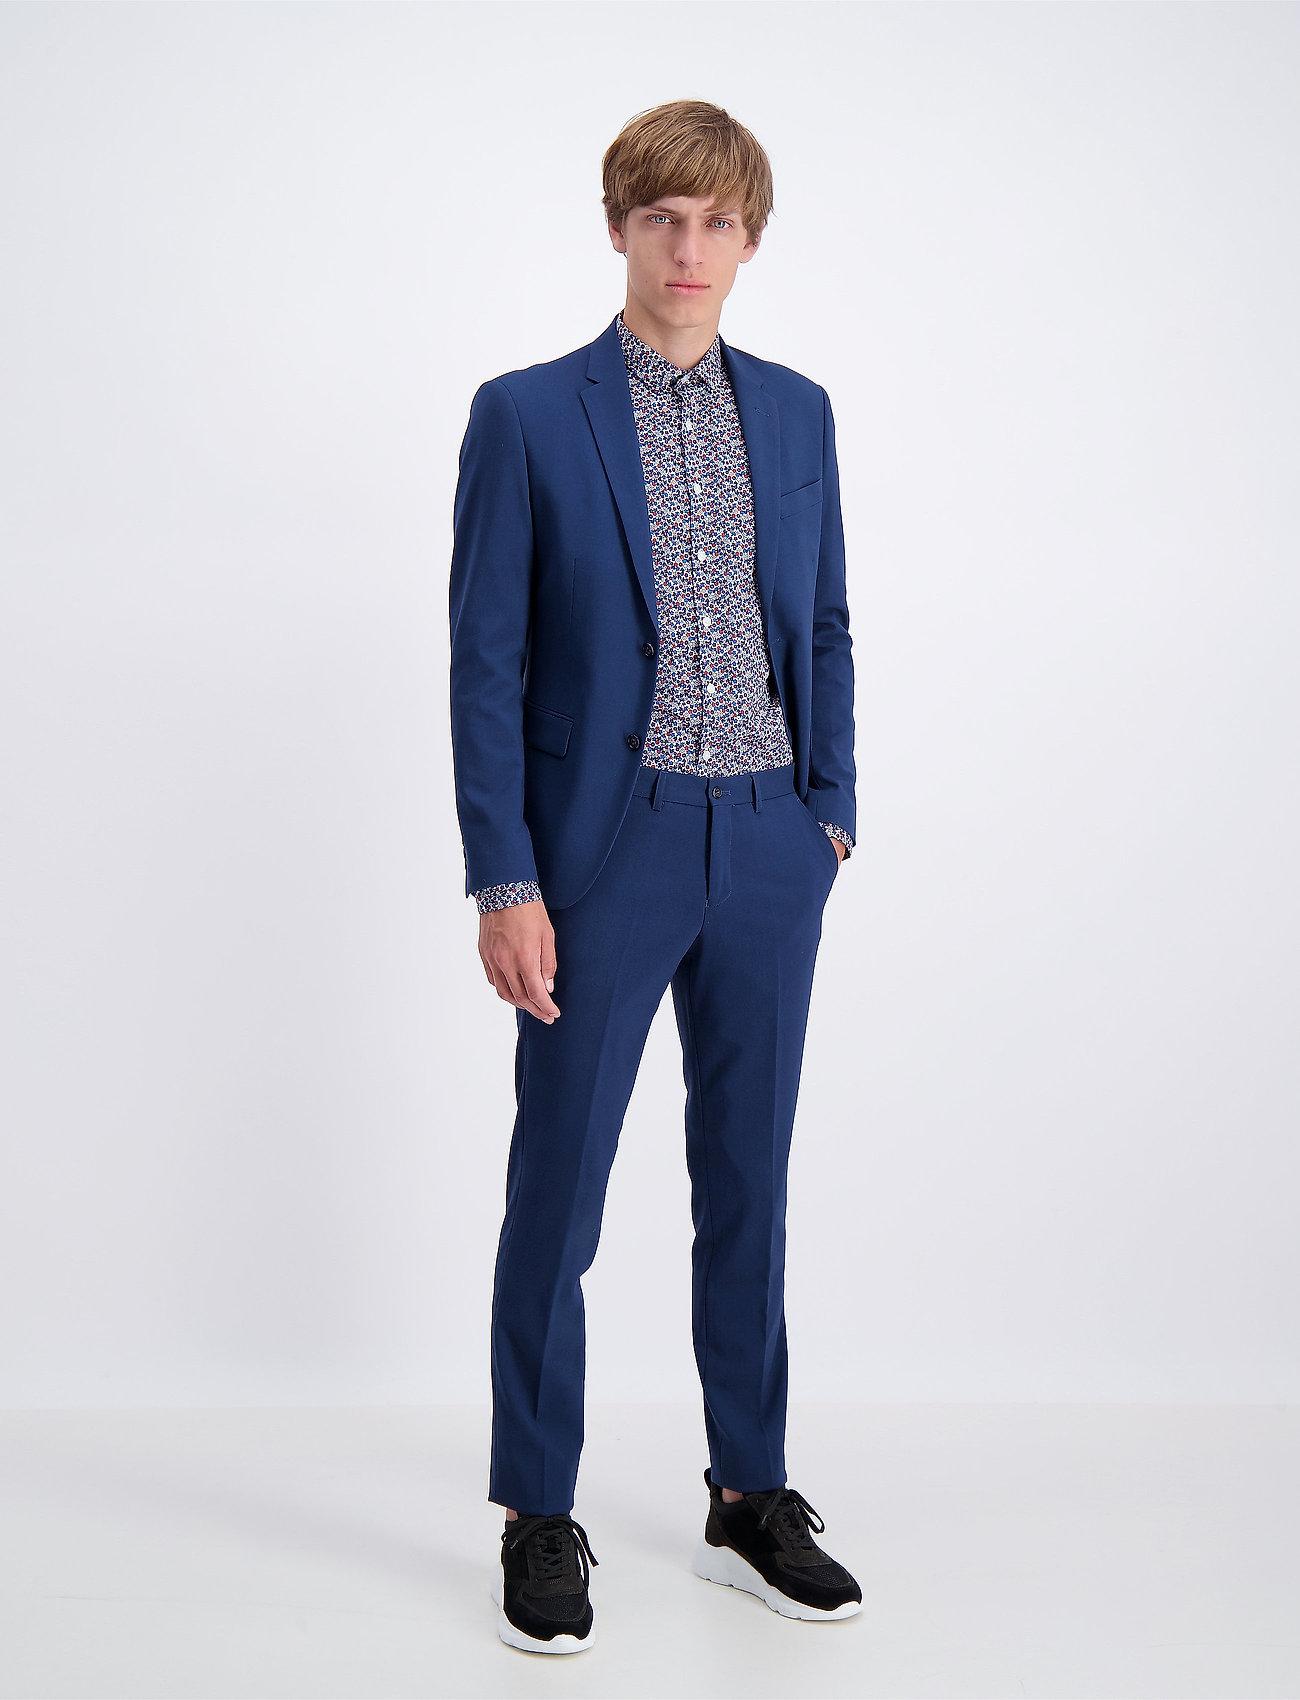 Lindbergh - Plain mens suit - yksiriviset puvut - dk blue - 0